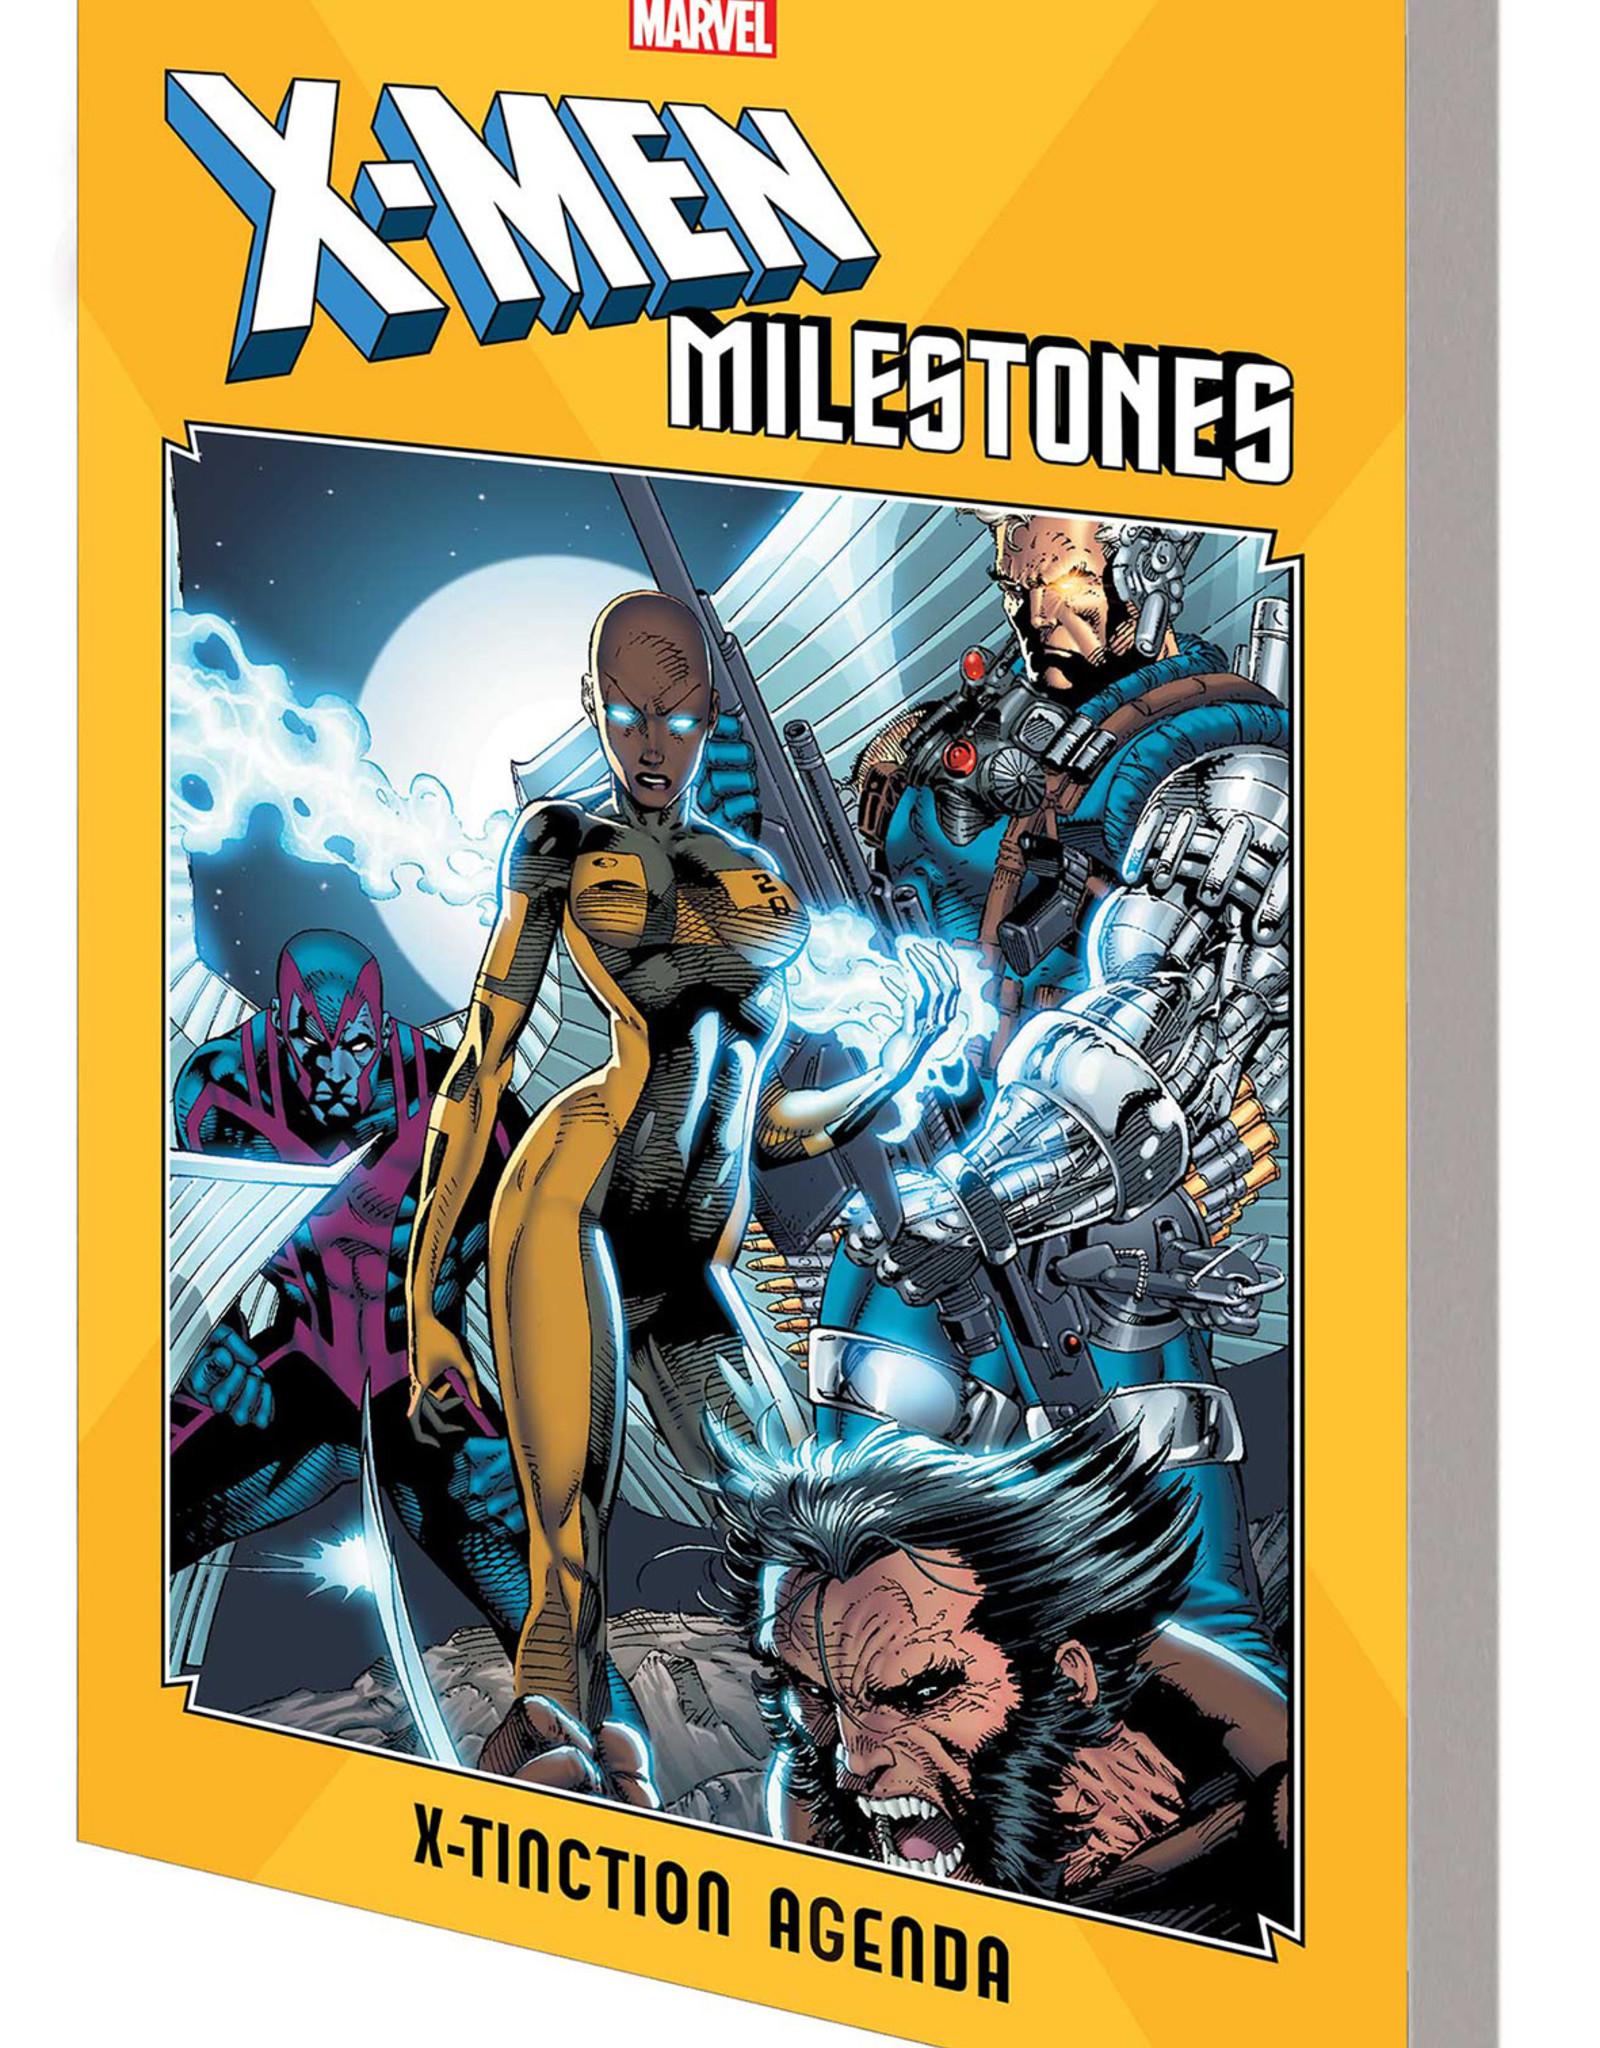 MARVEL COMICS X-MEN MILESTONES TP X-TINCTION AGENDA